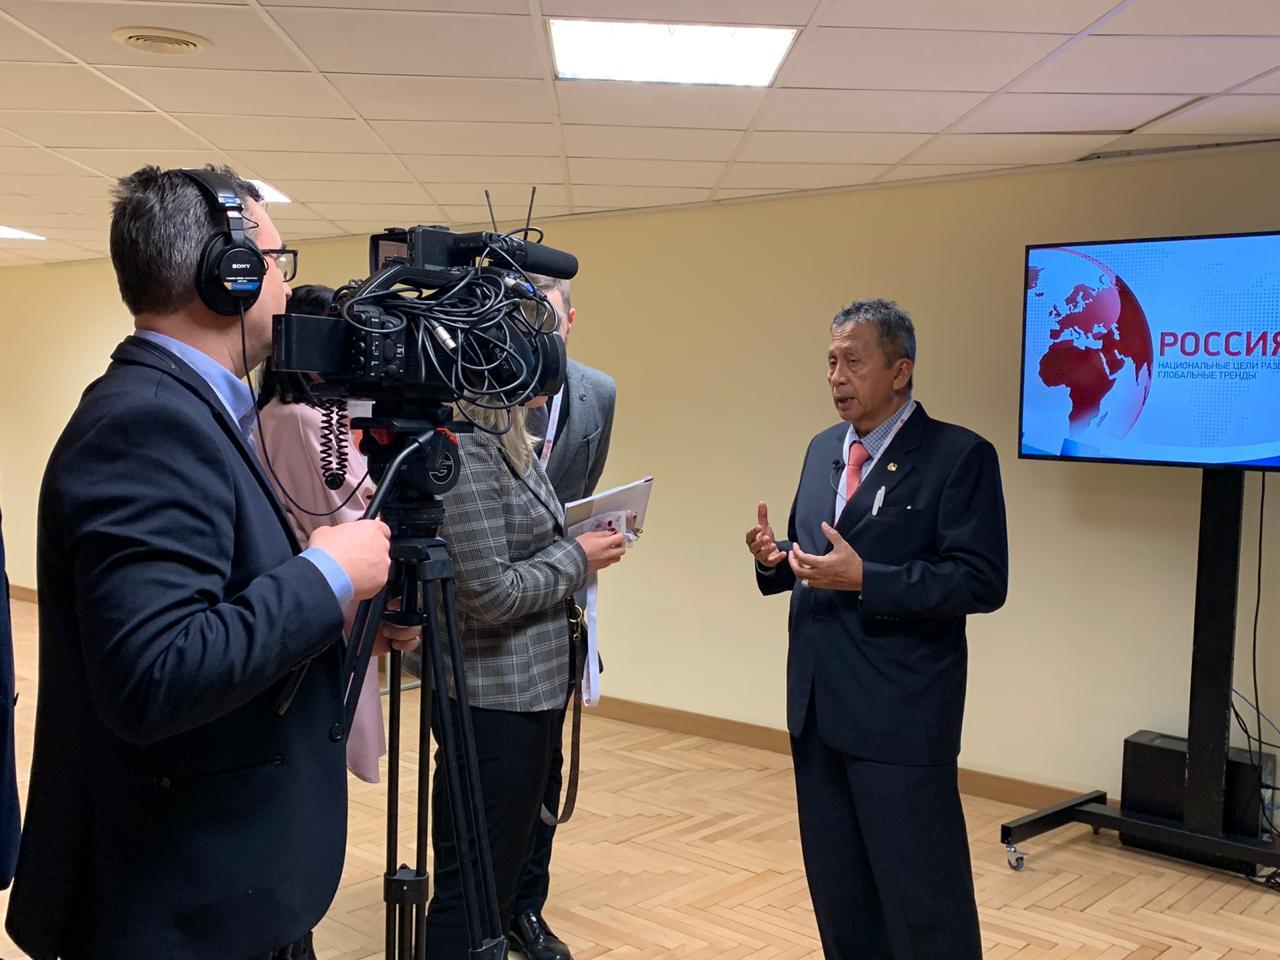 Ketua BPK Jelaskan Rencana Audit Strategis di Gaidar Forum Yang Digelar di Rusia